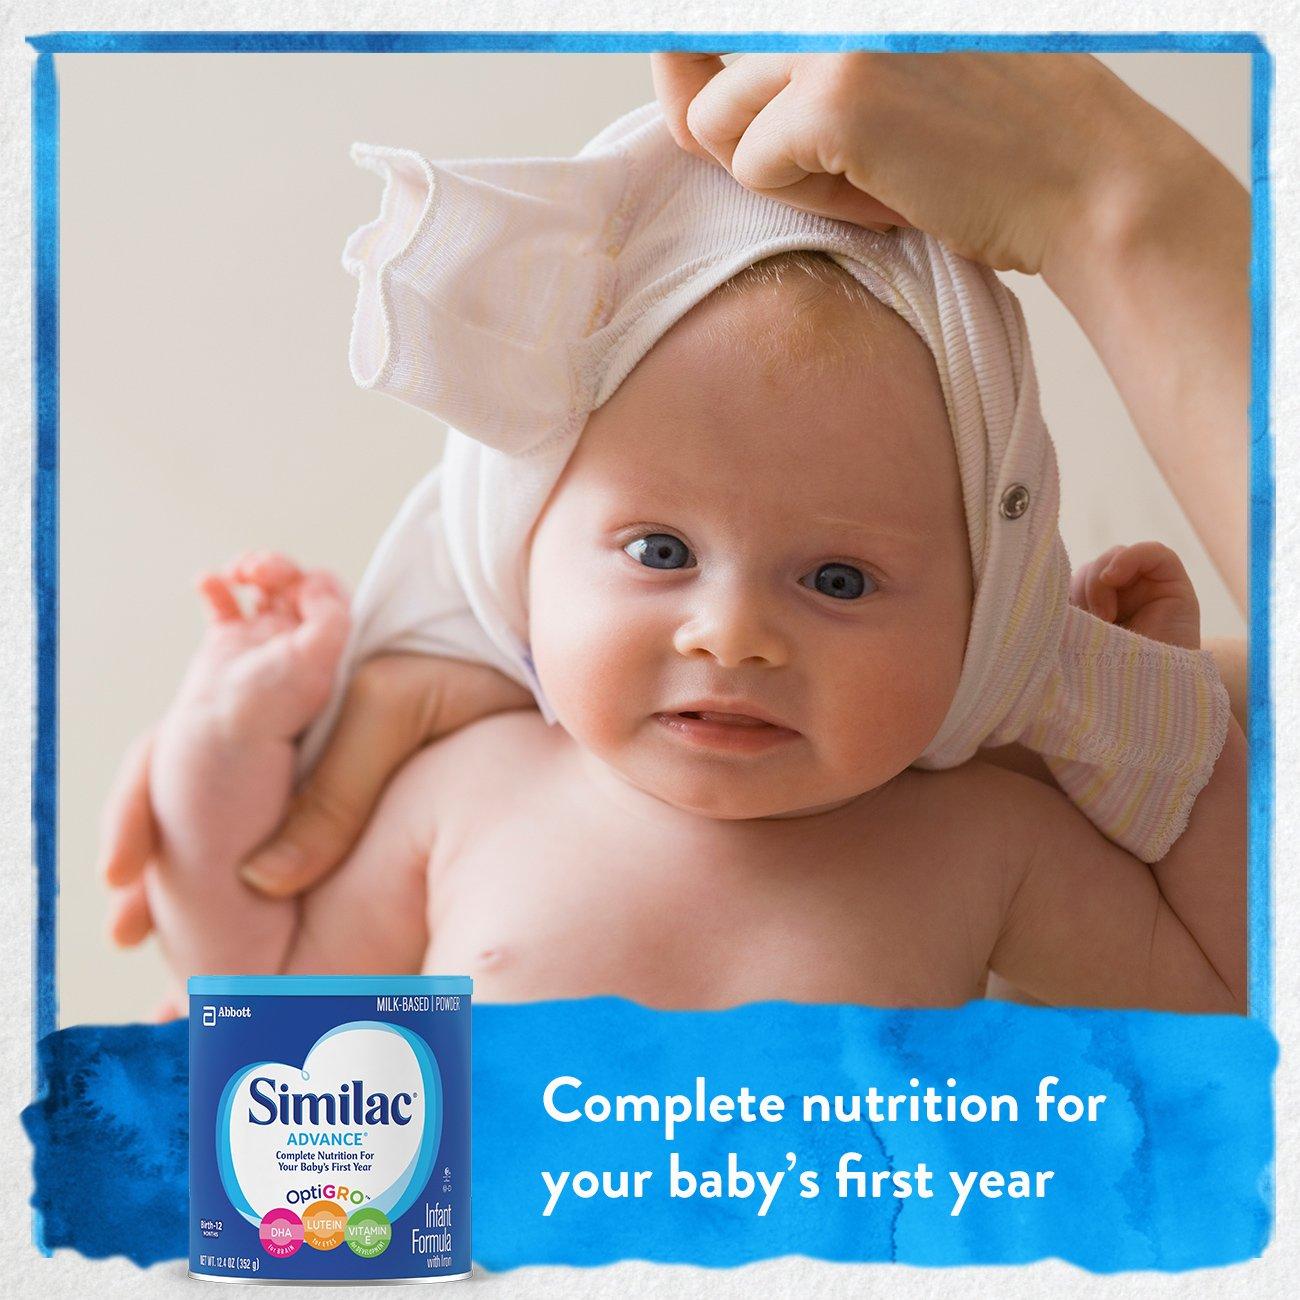 Similac Advance Infant Formula with Iron, Baby Formula, Powder, 12.4 oz (Pack of 6) by Similac (Image #3)